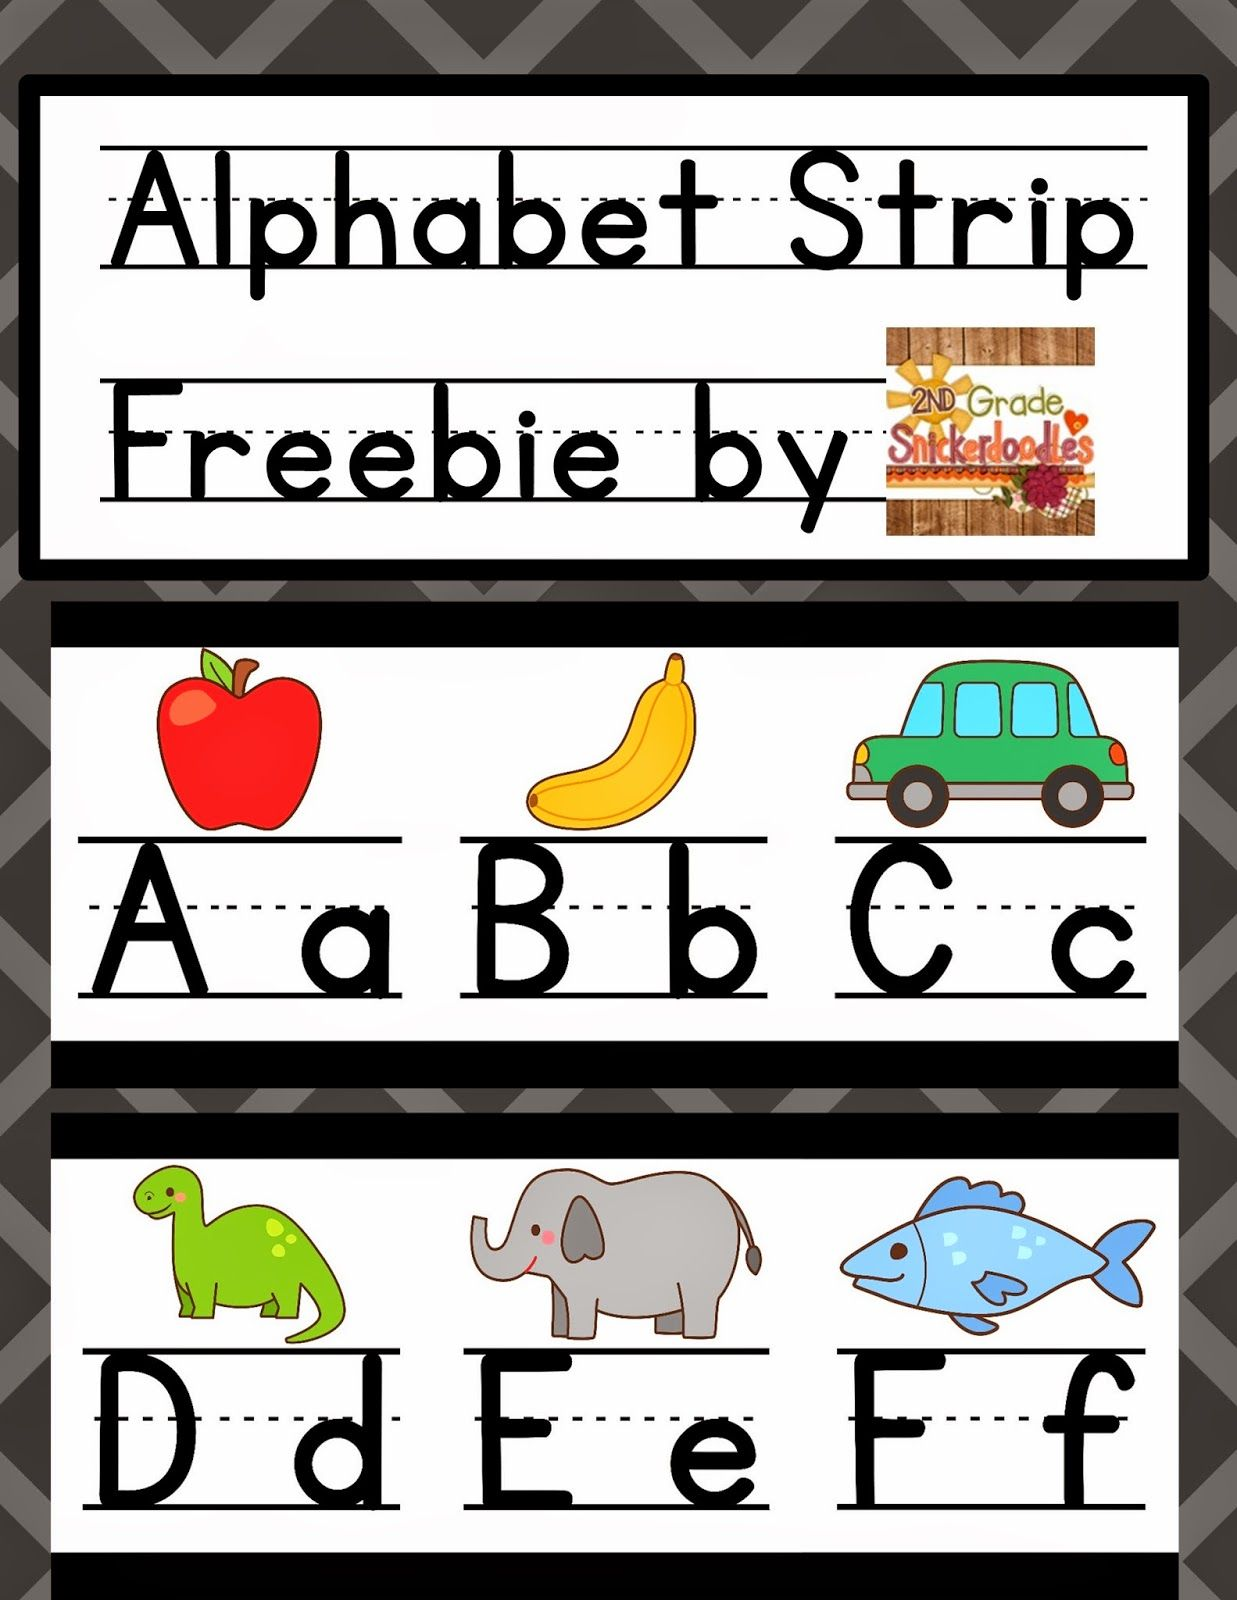 2nd grade snickerdoodles alphabet strip posters freebie. Black Bedroom Furniture Sets. Home Design Ideas